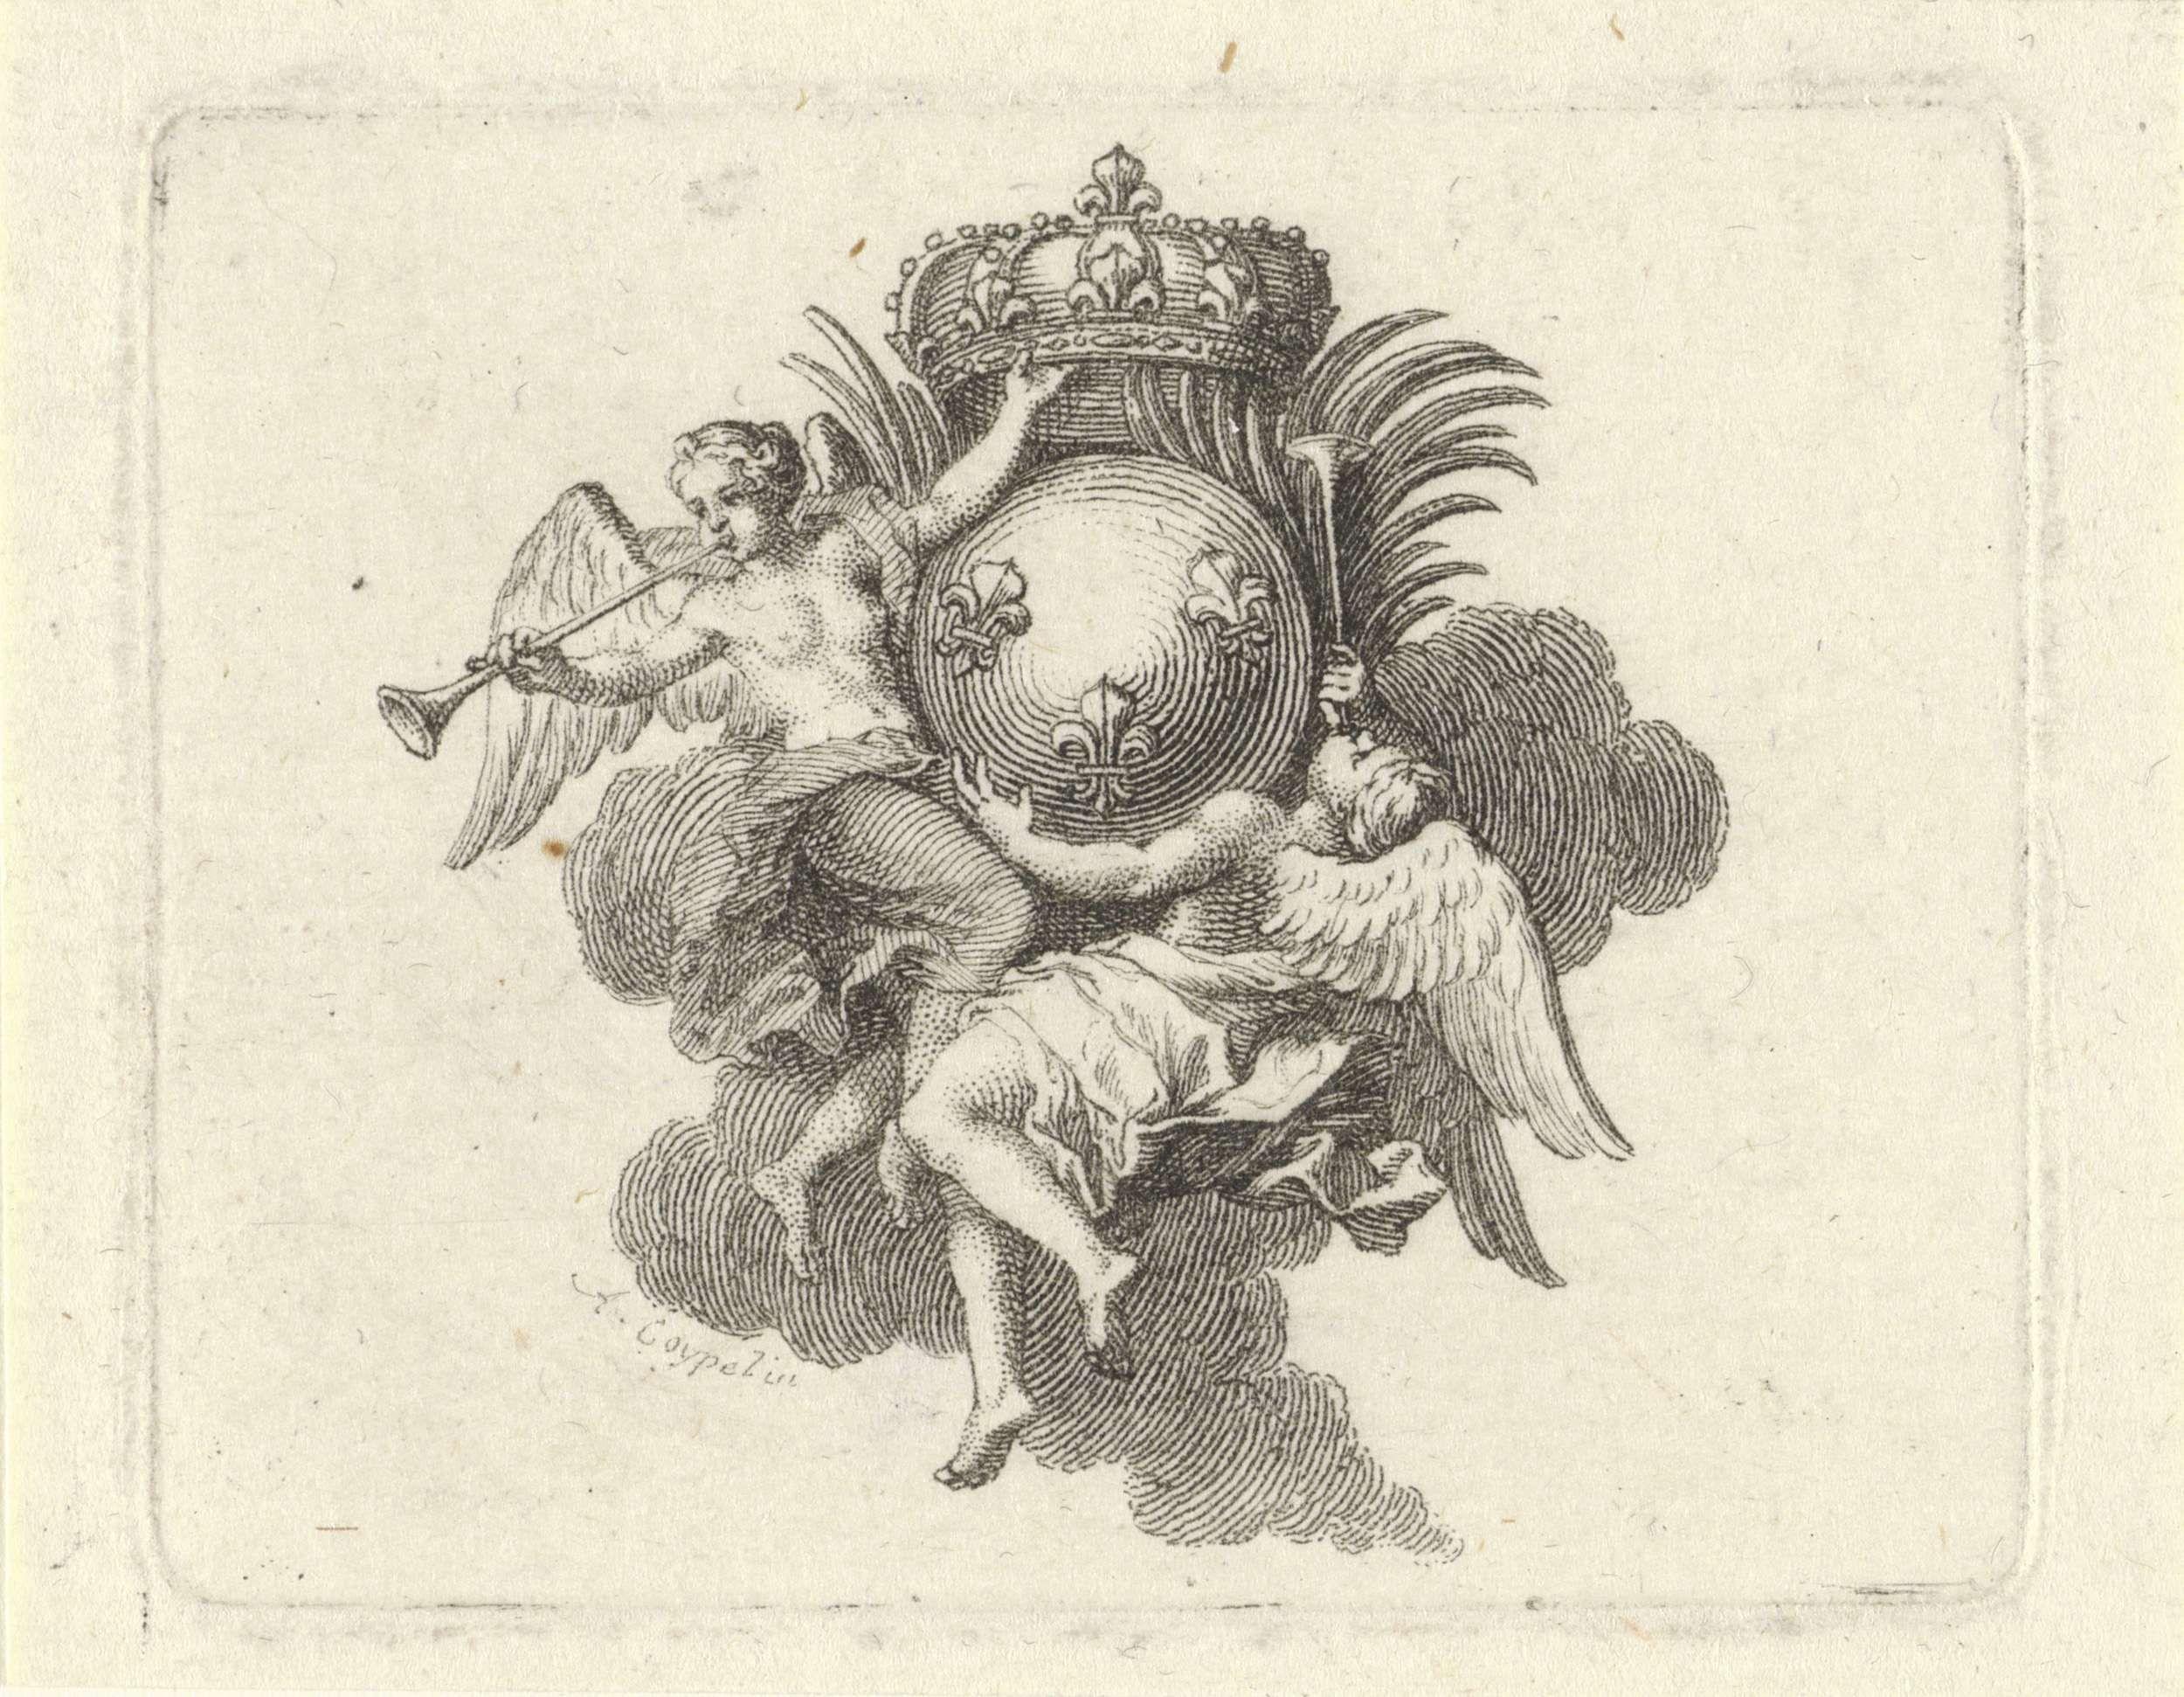 Anonymous | Faam met het Franse wapenschild, Anonymous, 1671 - 1772 |